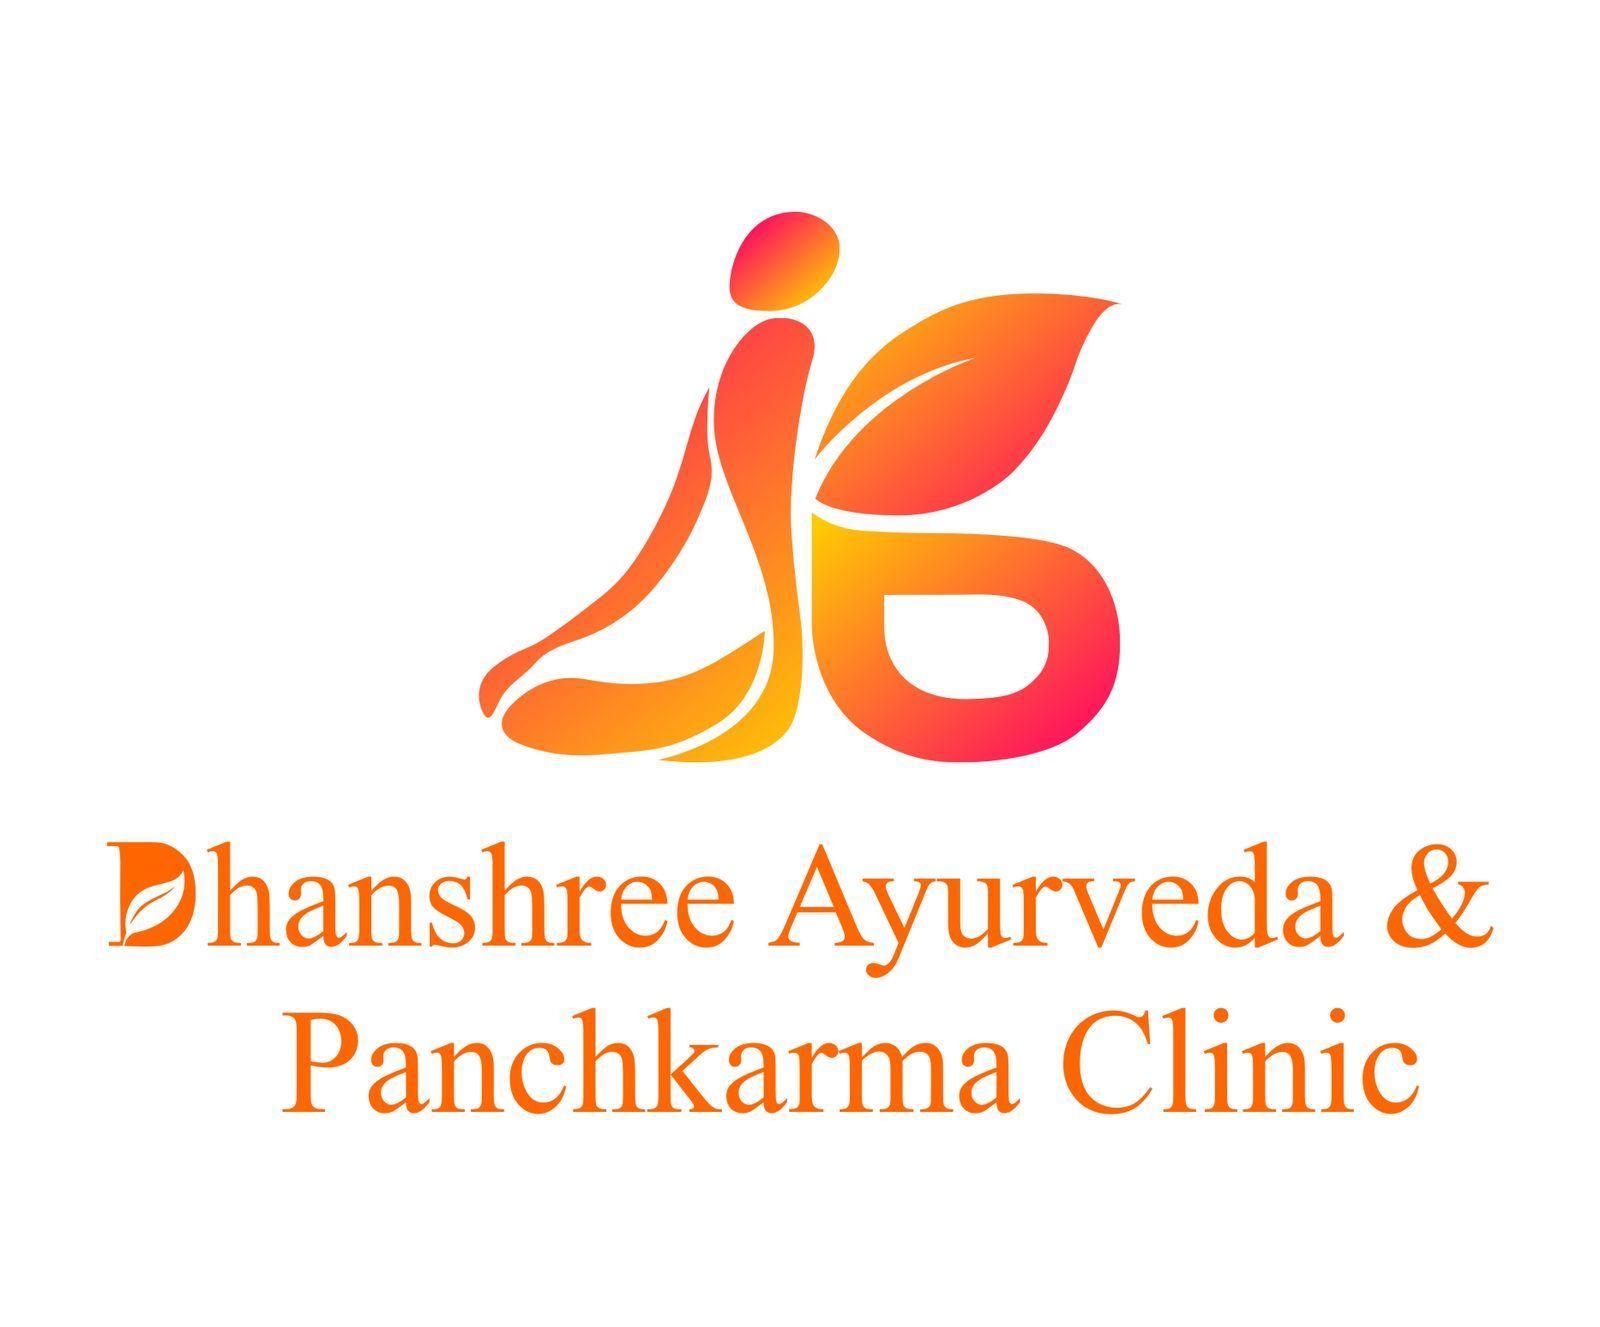 Dhanshree Ayurveda Clinic & Panchkarma Centre